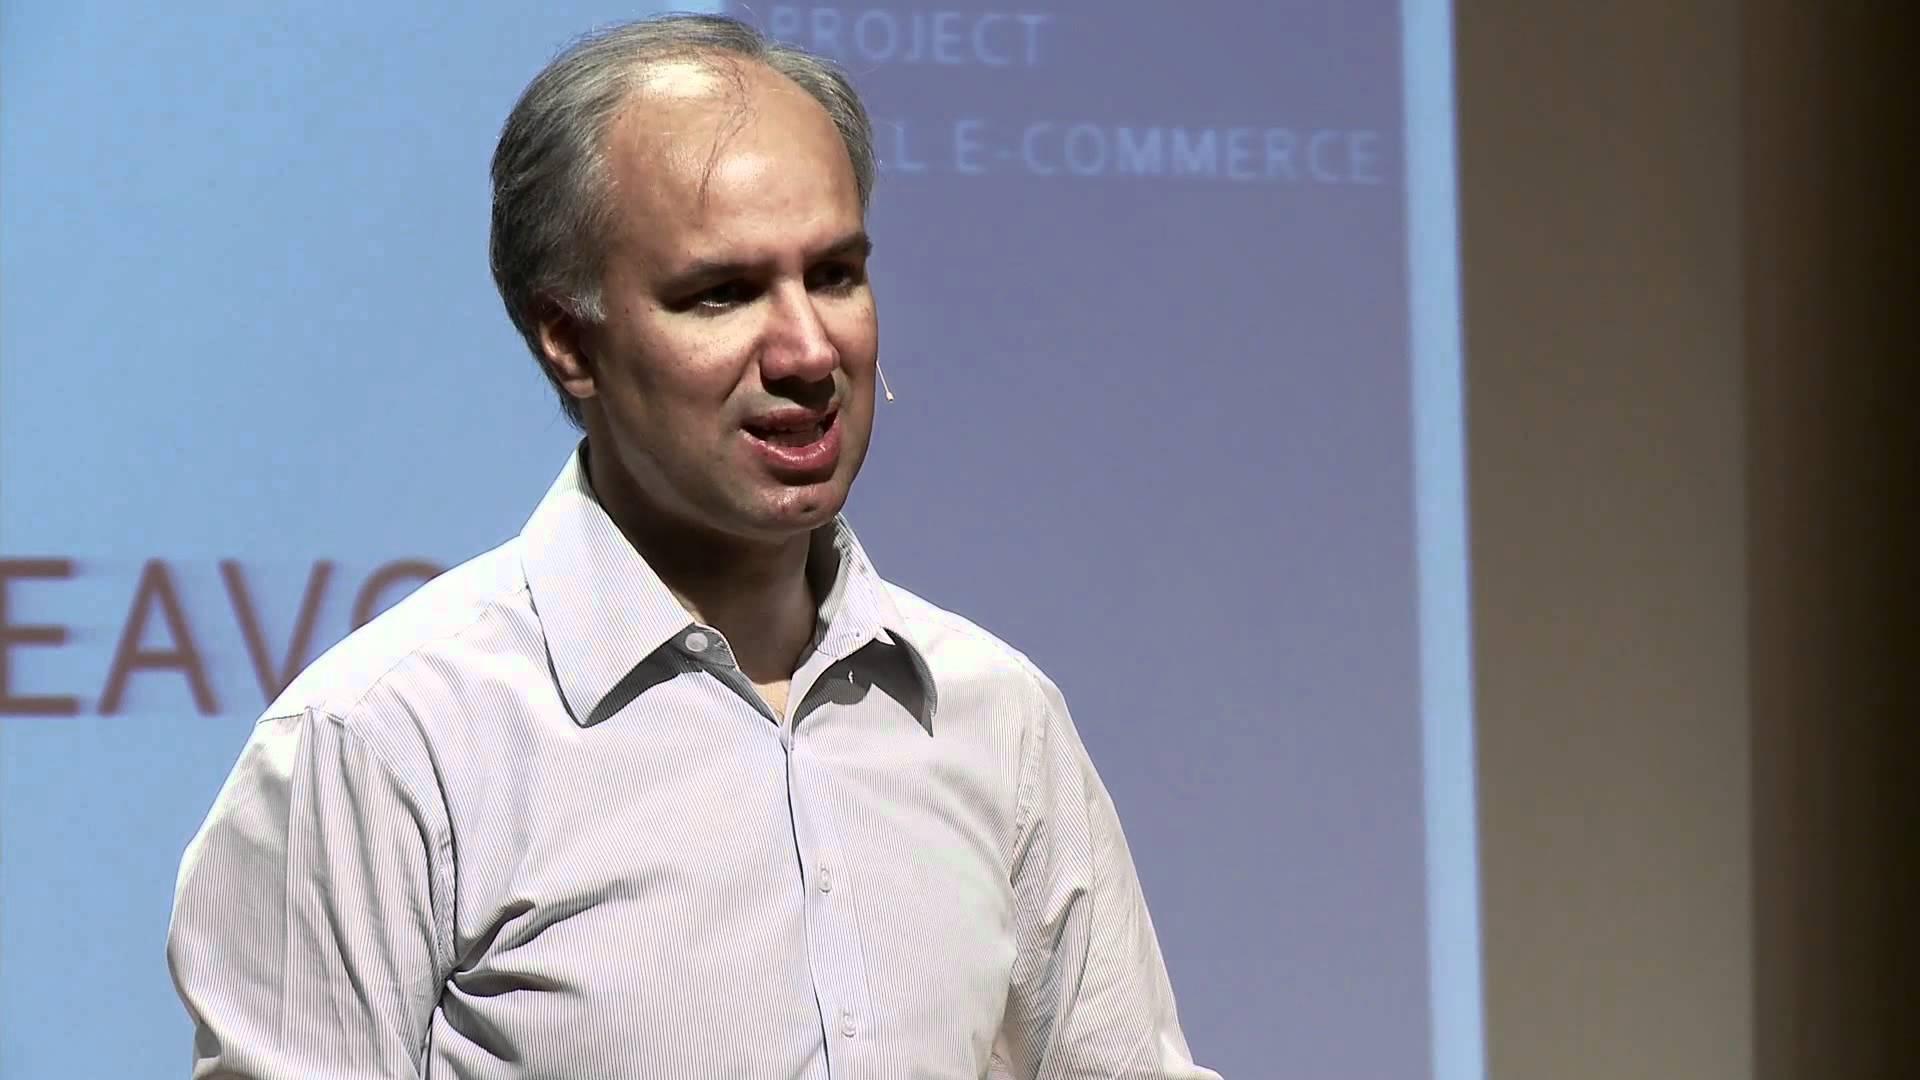 e-Talks | E-commerce: Valuation de Novas Empresas Digitais – Edson Rigonatti [Astella Investimento]